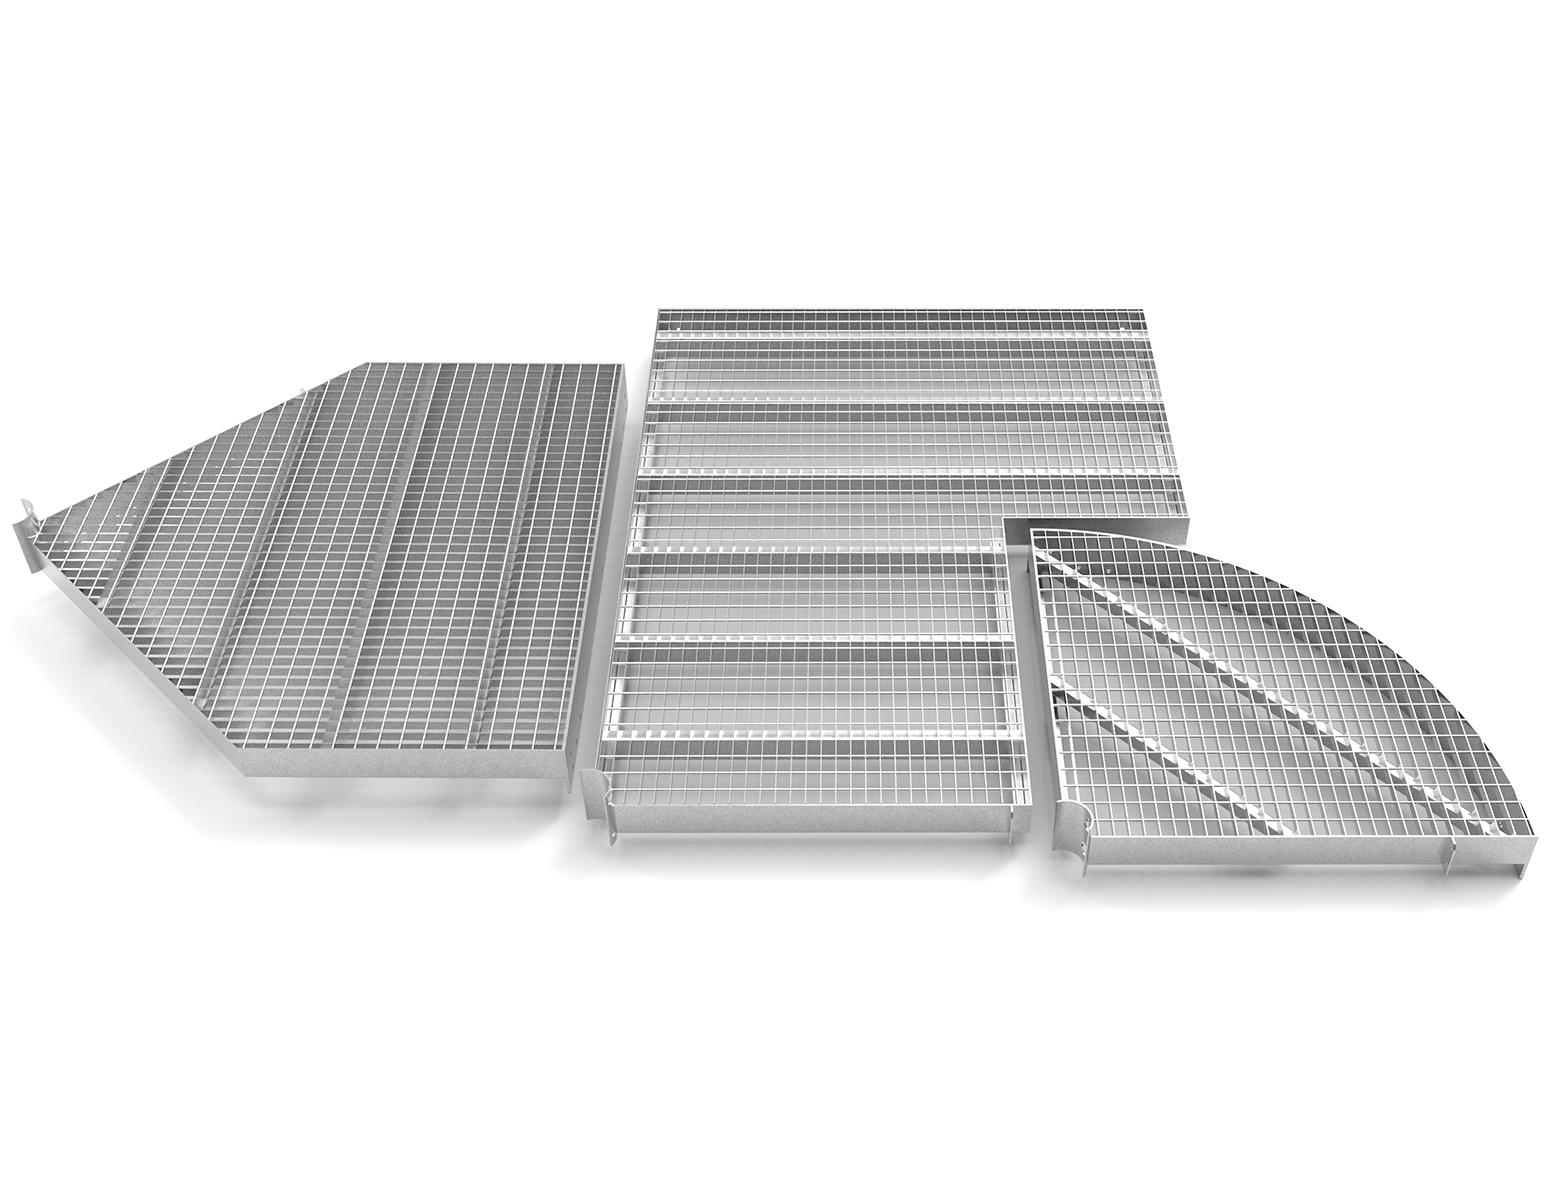 spiral staircase alighting platform